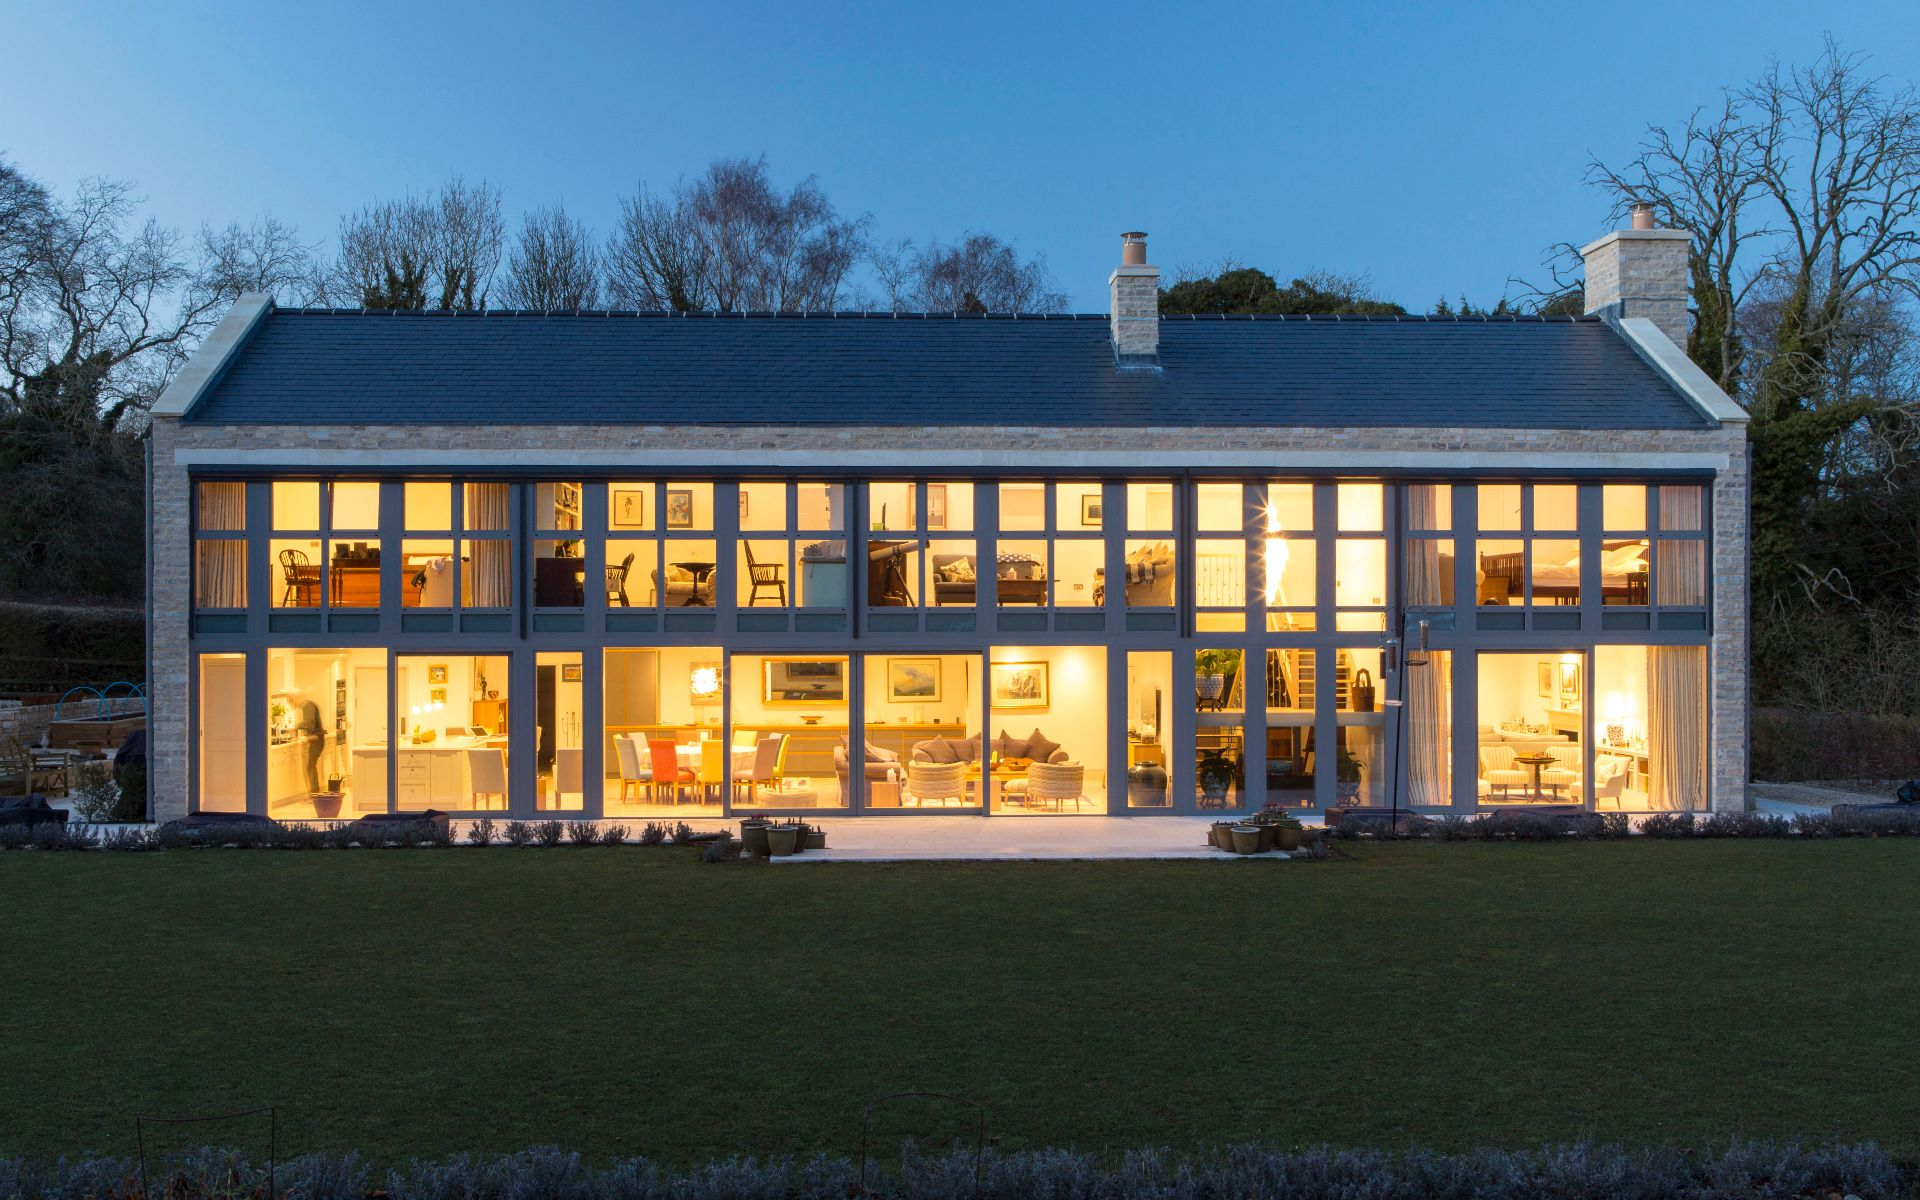 Oxfordshire Gloucestershire Building Project Management Services new build